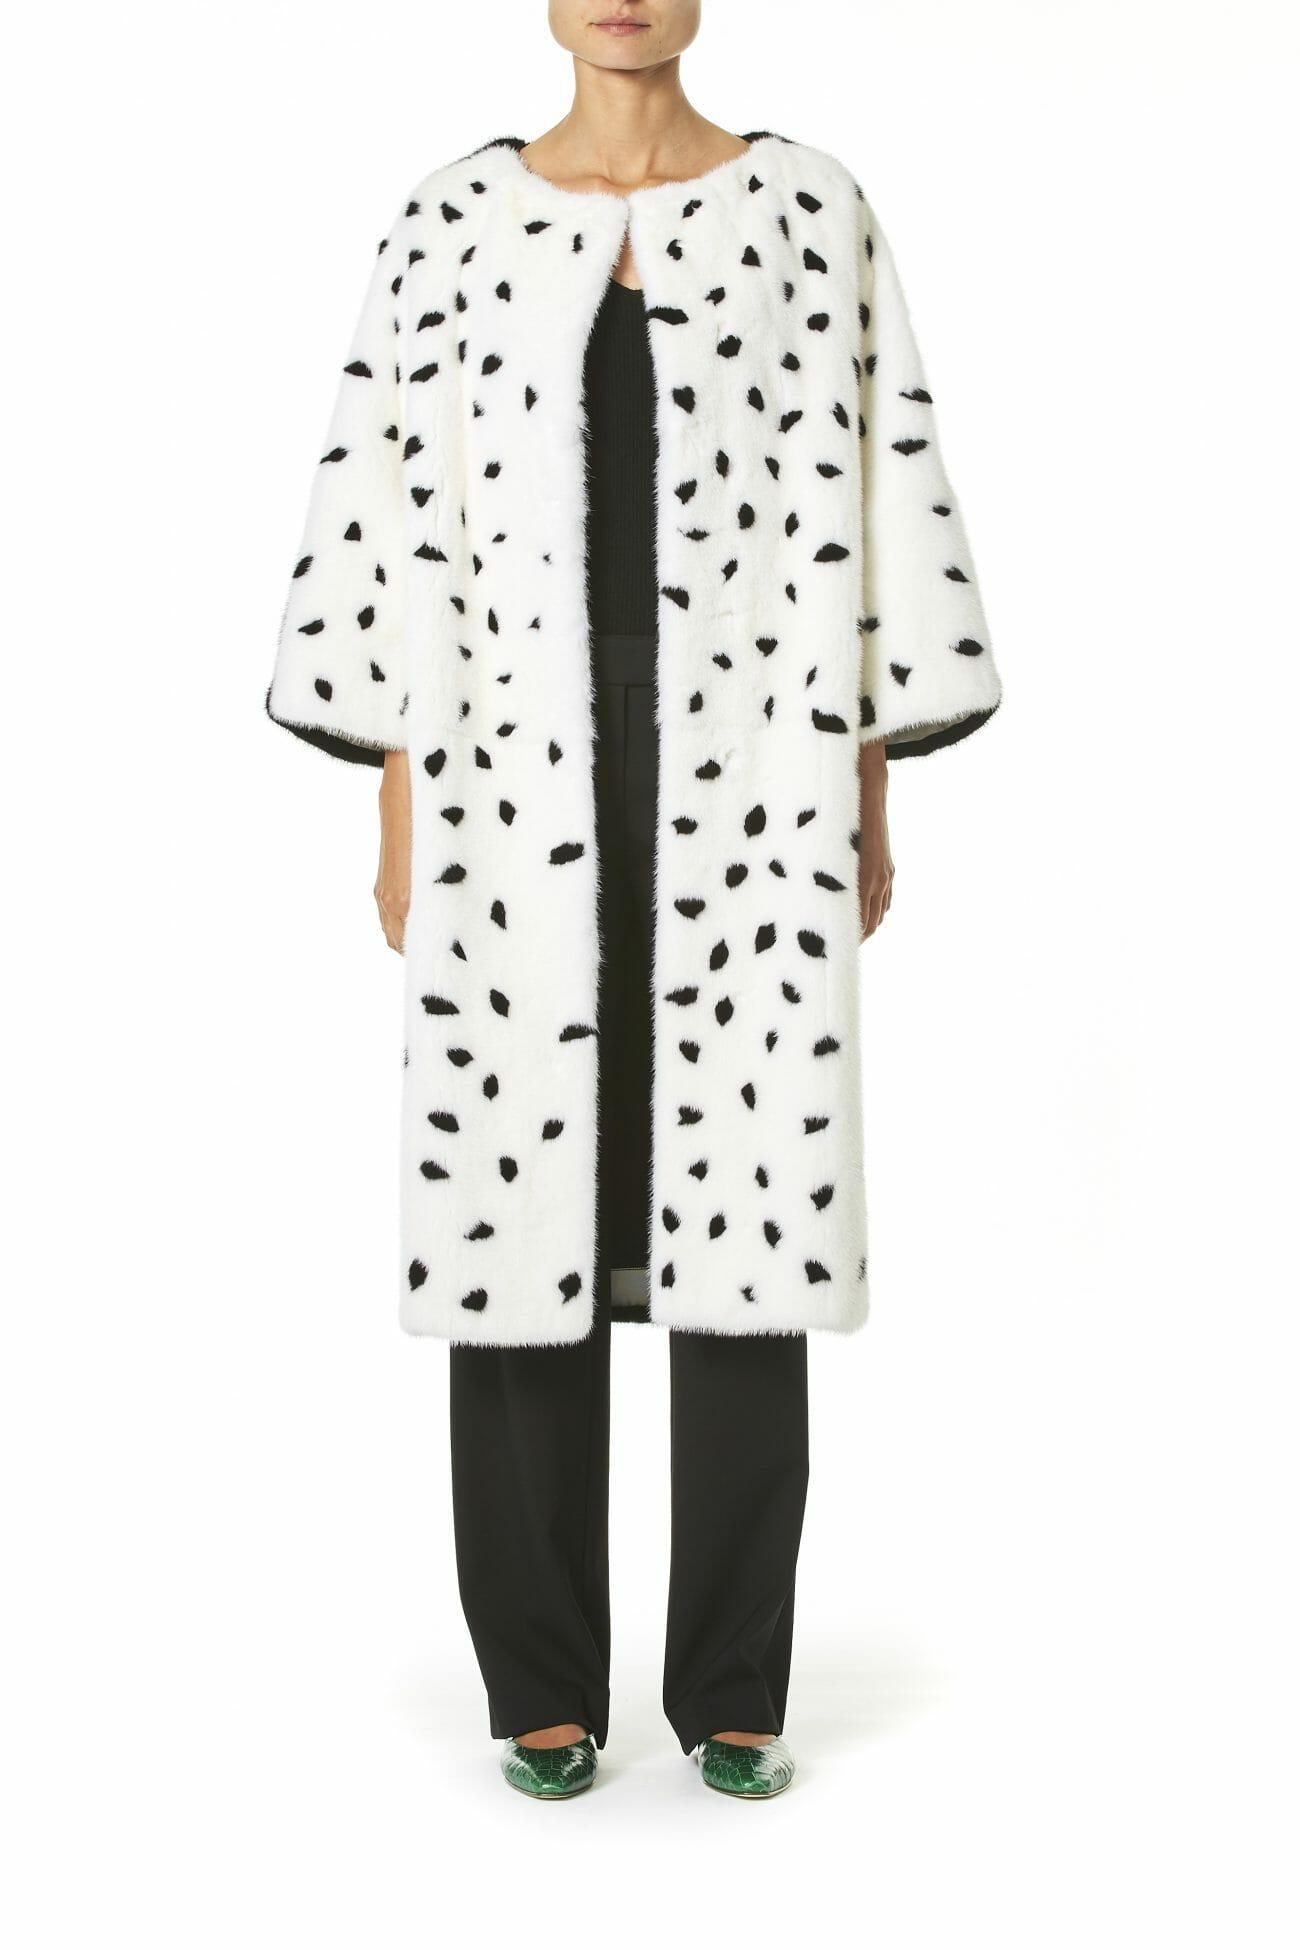 Carolina-Herrera-New-York-Resort-2019-look-155-coat-white-black-dalmata-dots